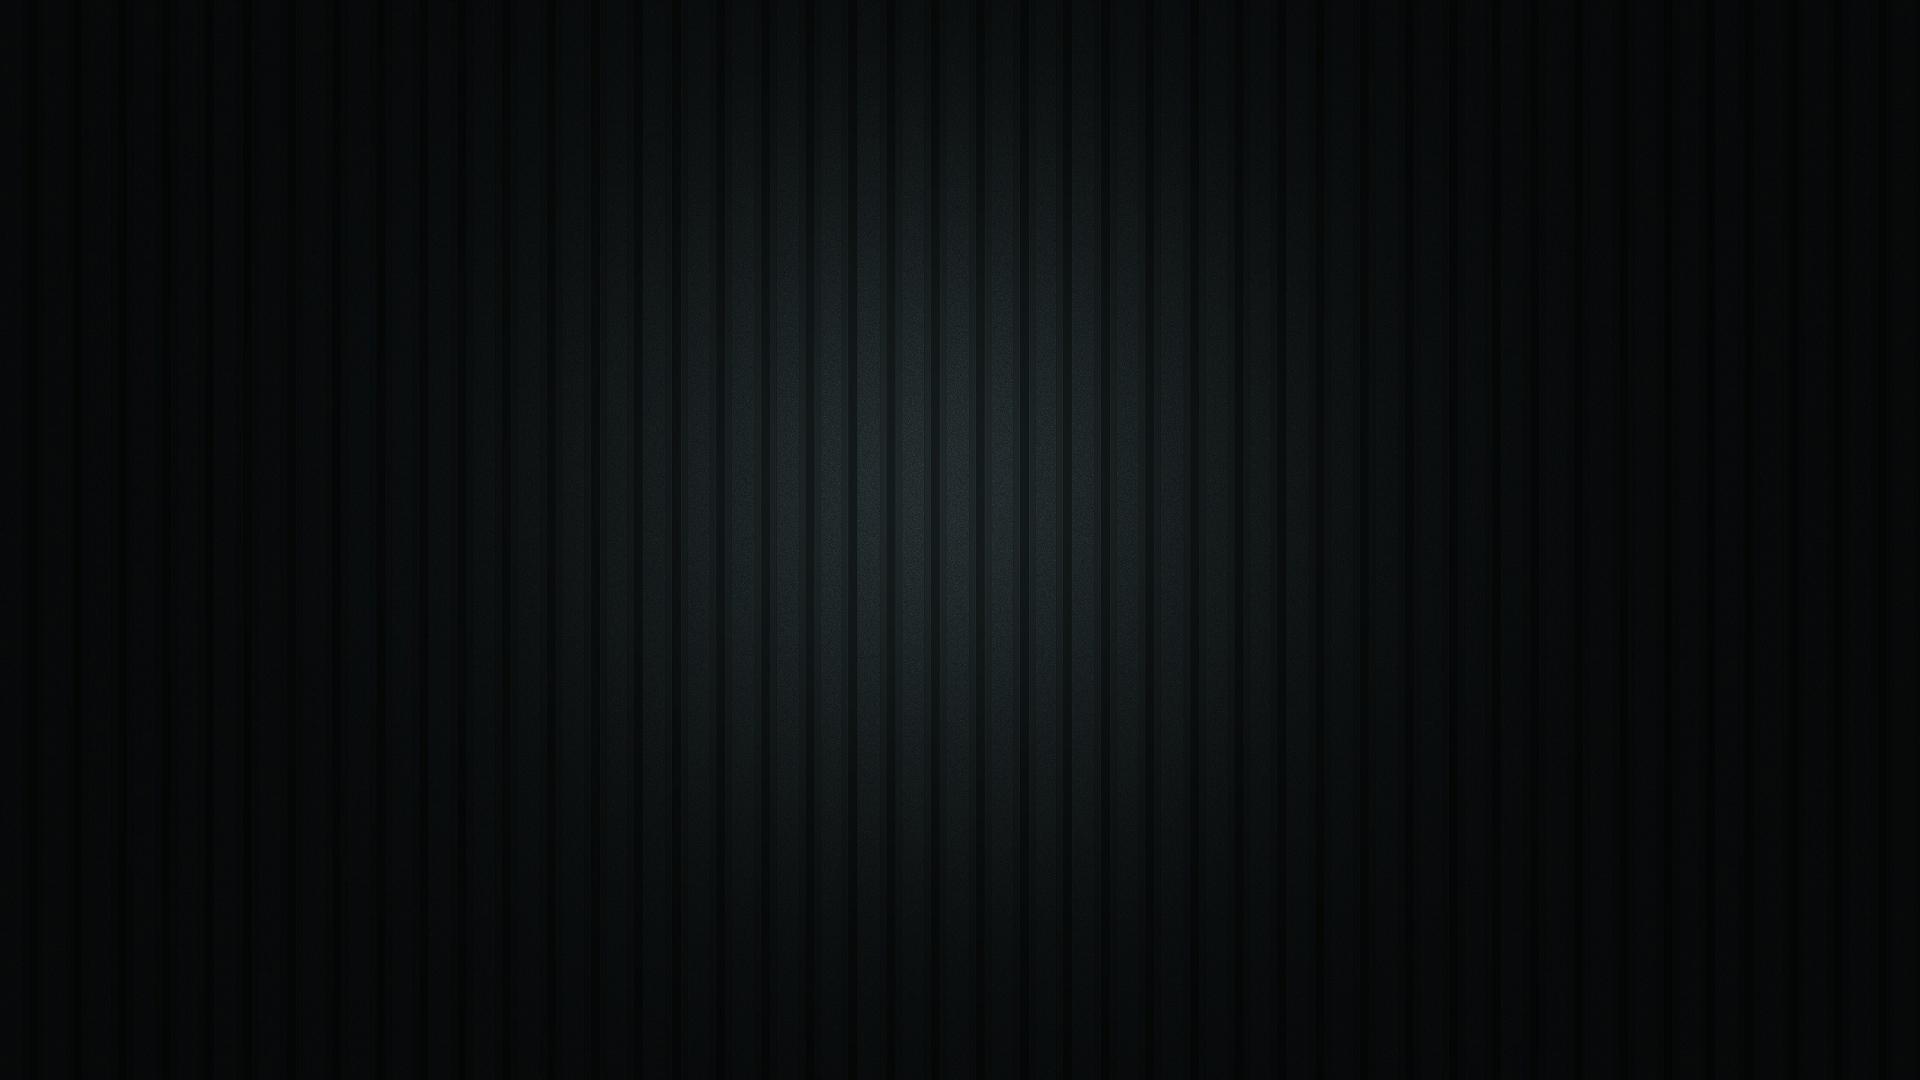 download wallpaper 1920x1080 black lines background